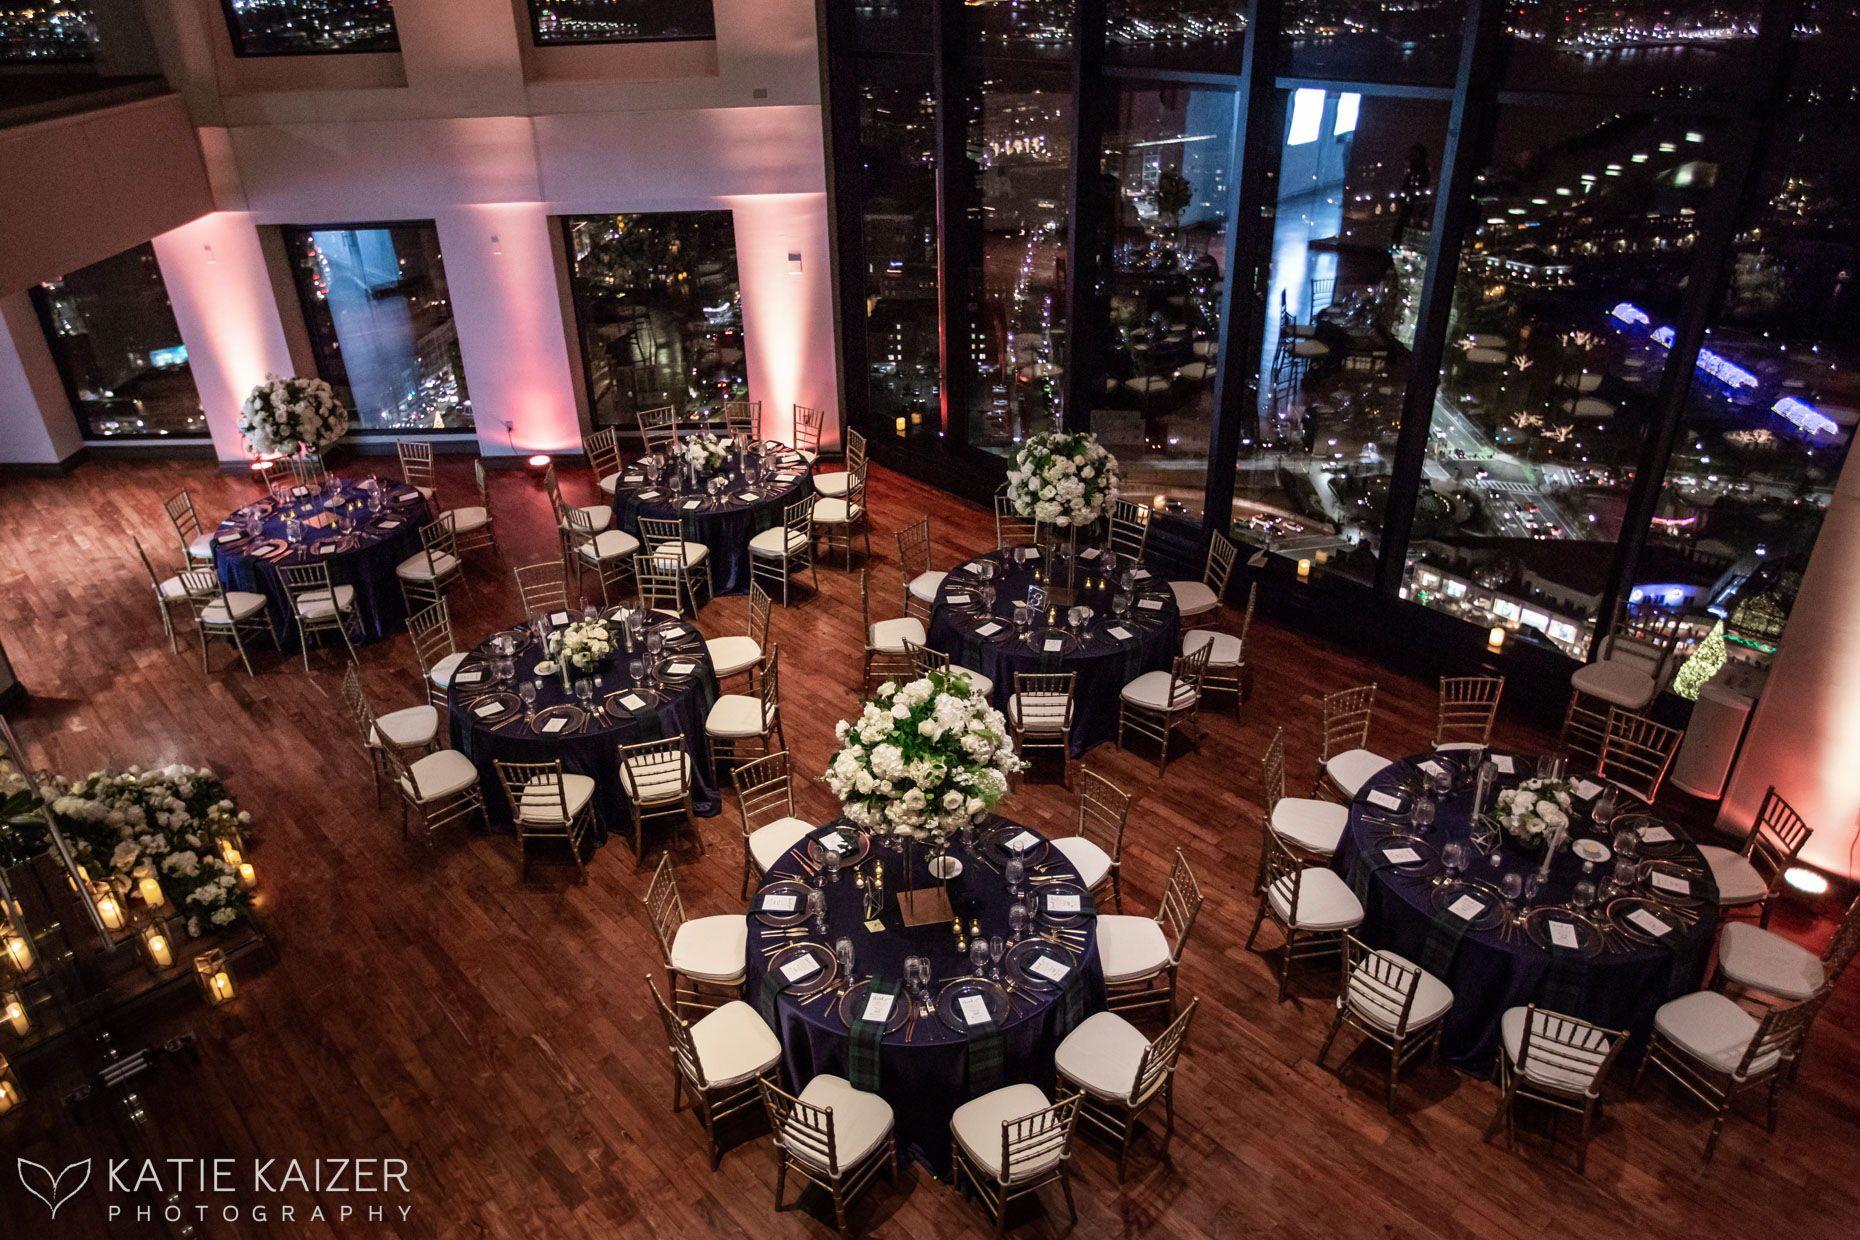 Real Boston Wedding At The State Room Boston Ma Longwood Venues Katie Kaizer Massachusetts Wedding Venues Boston Wedding Venues Table Arrangements Wedding